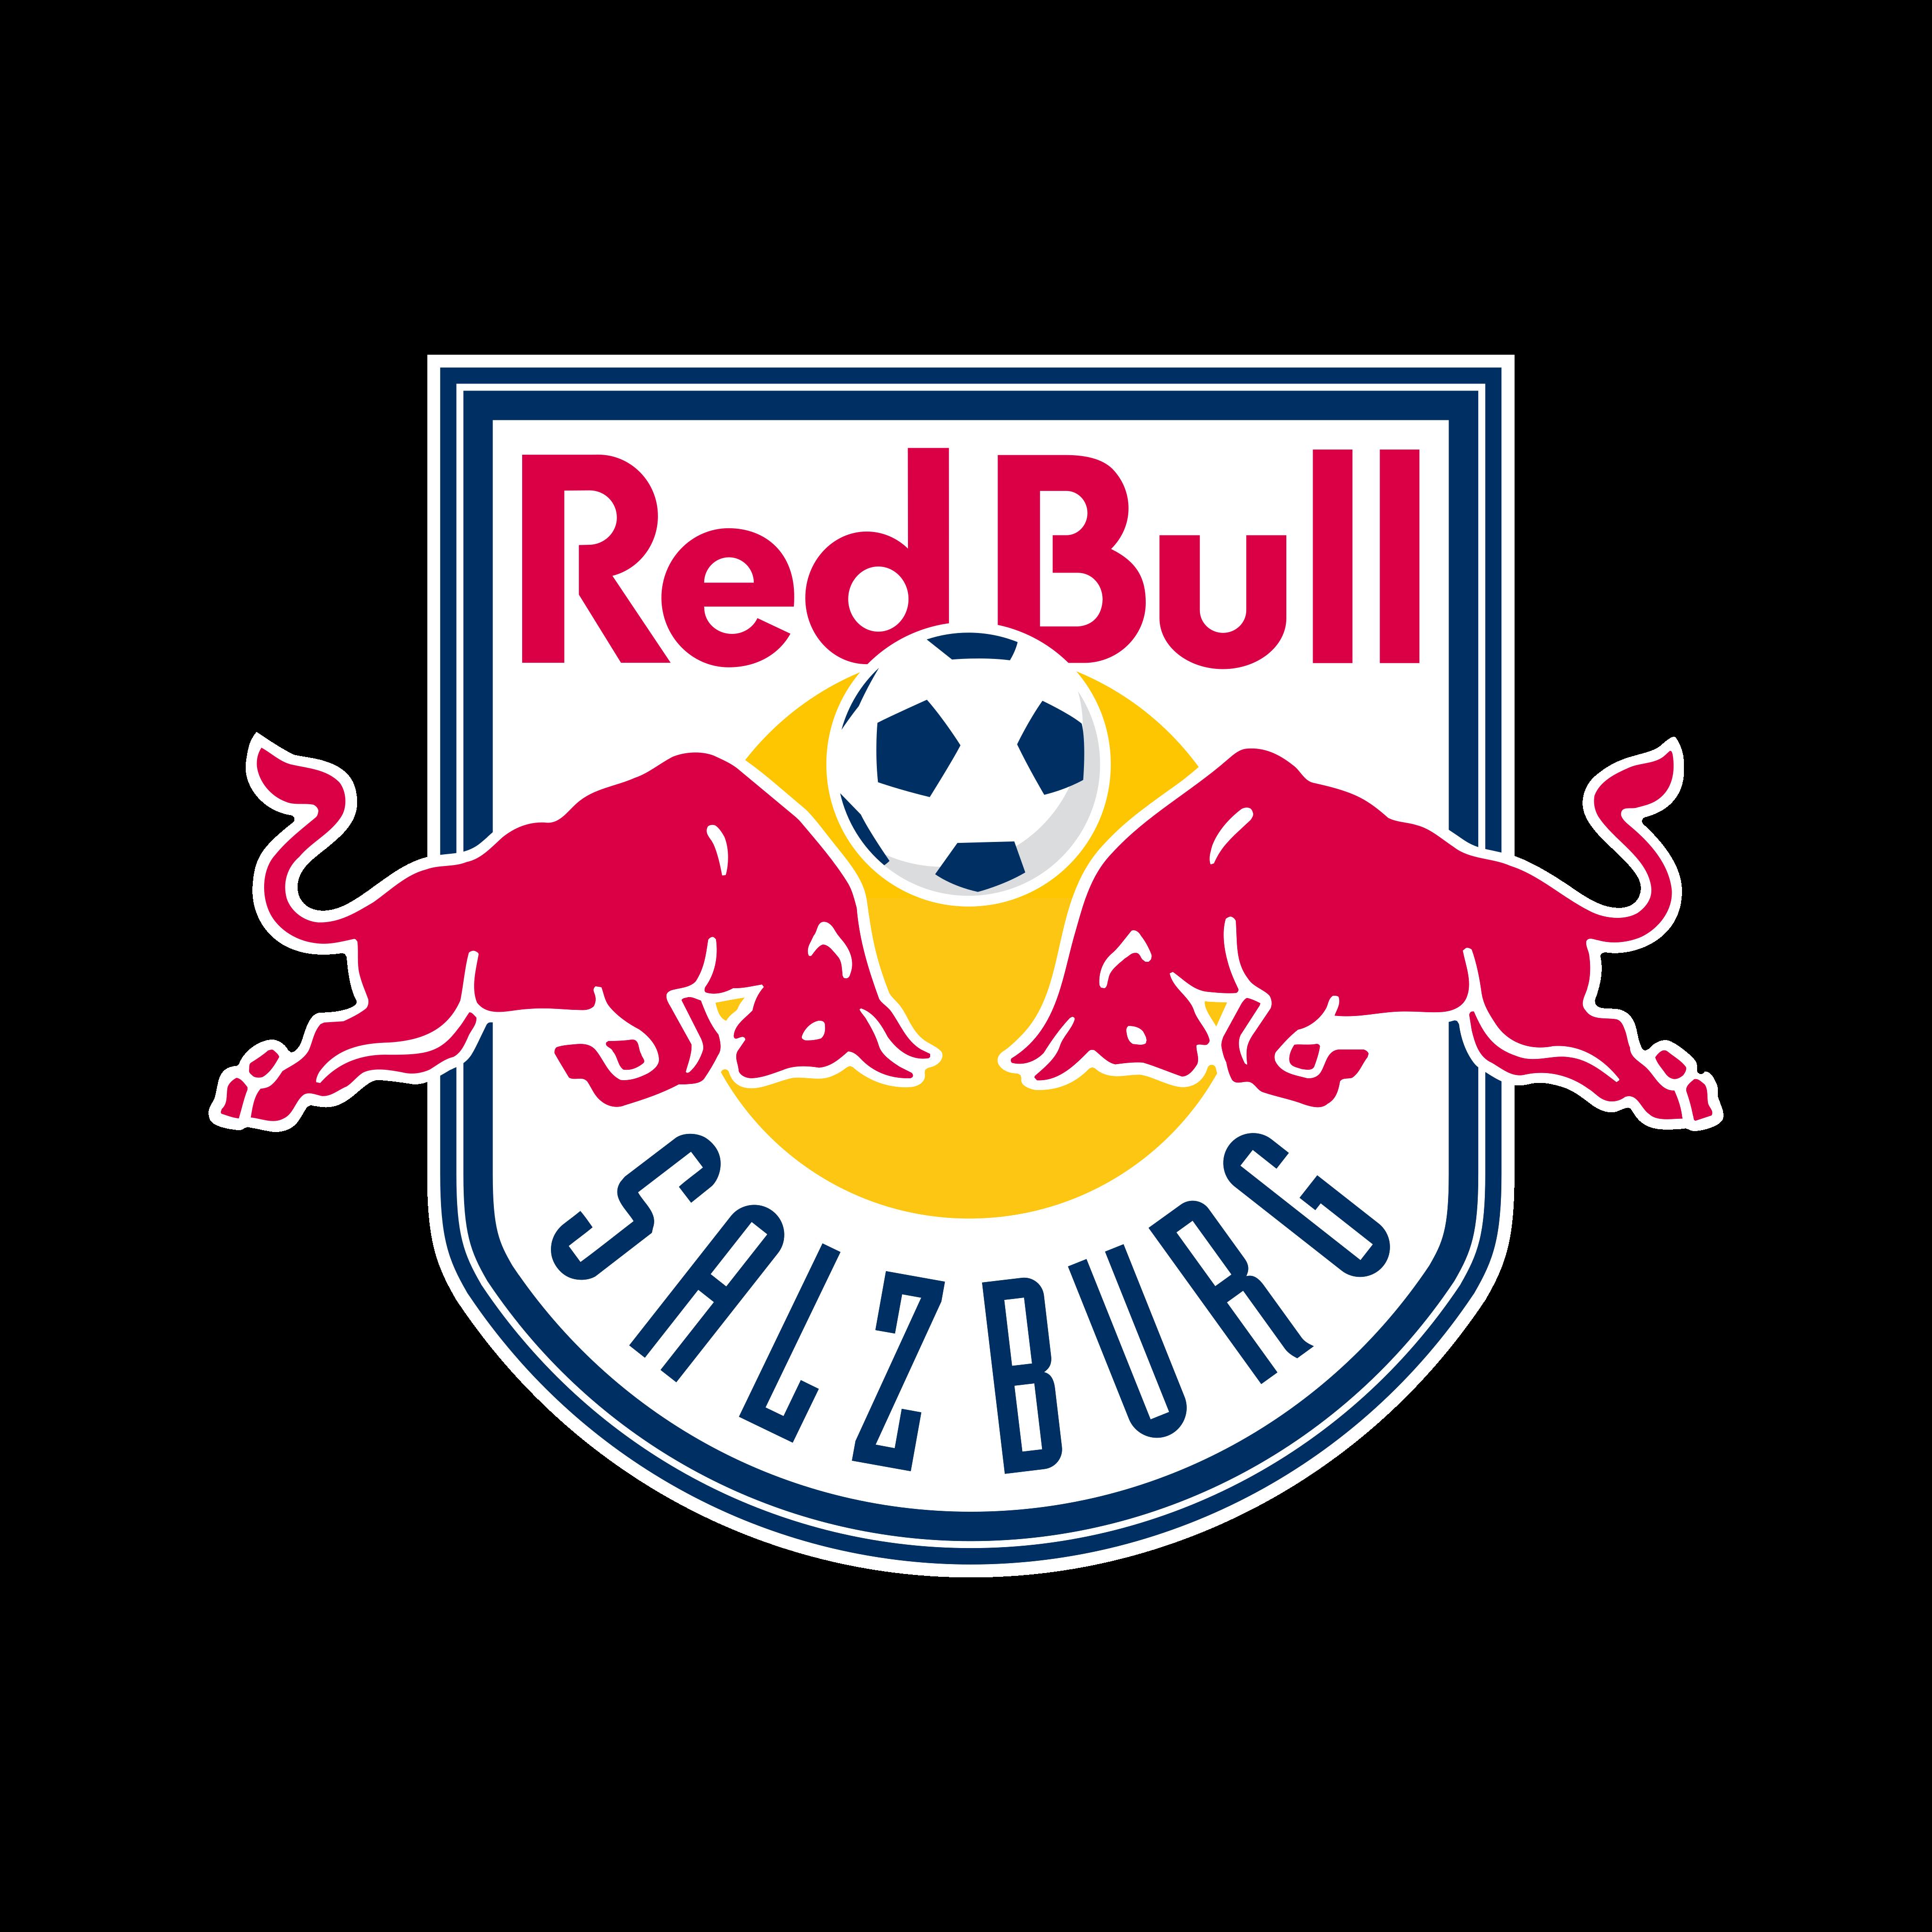 redbull salzburg logo 0 - Red Bull Salzburg Logo – Escudo